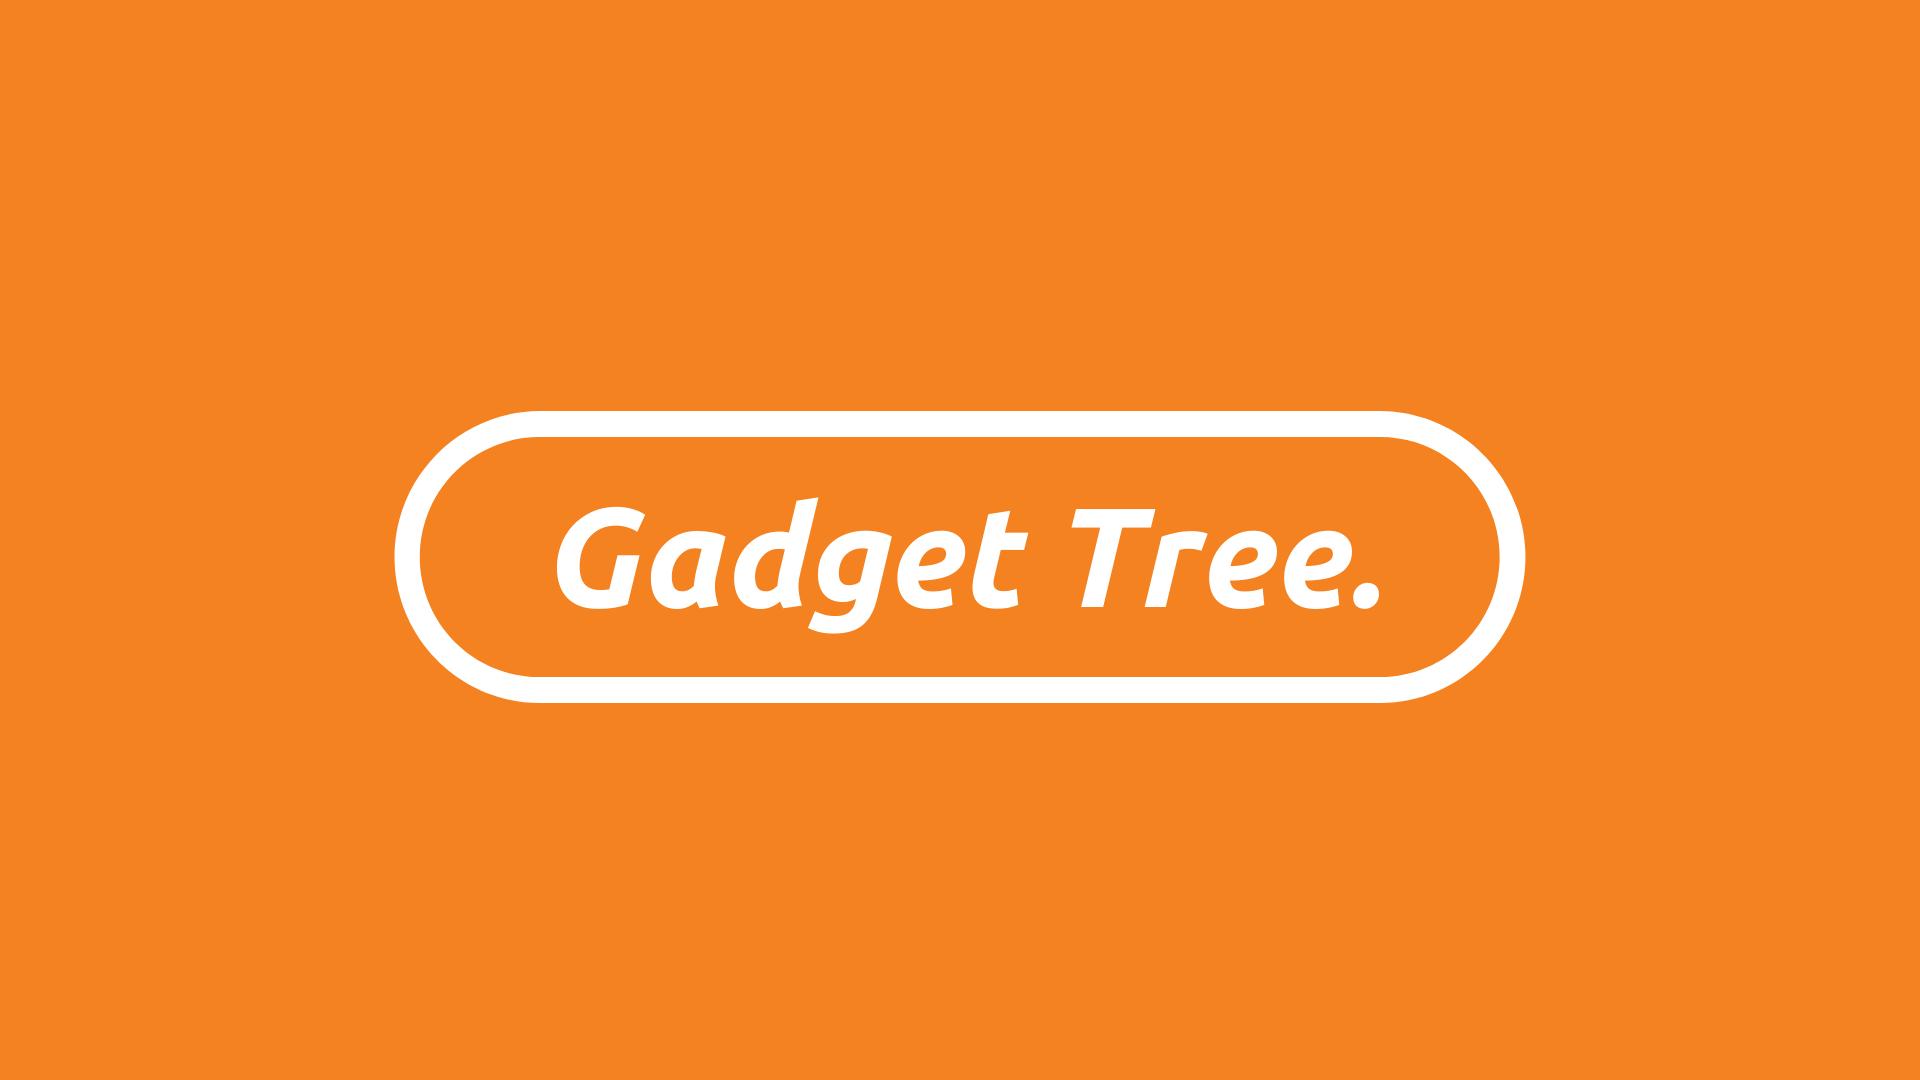 Gadget Tree